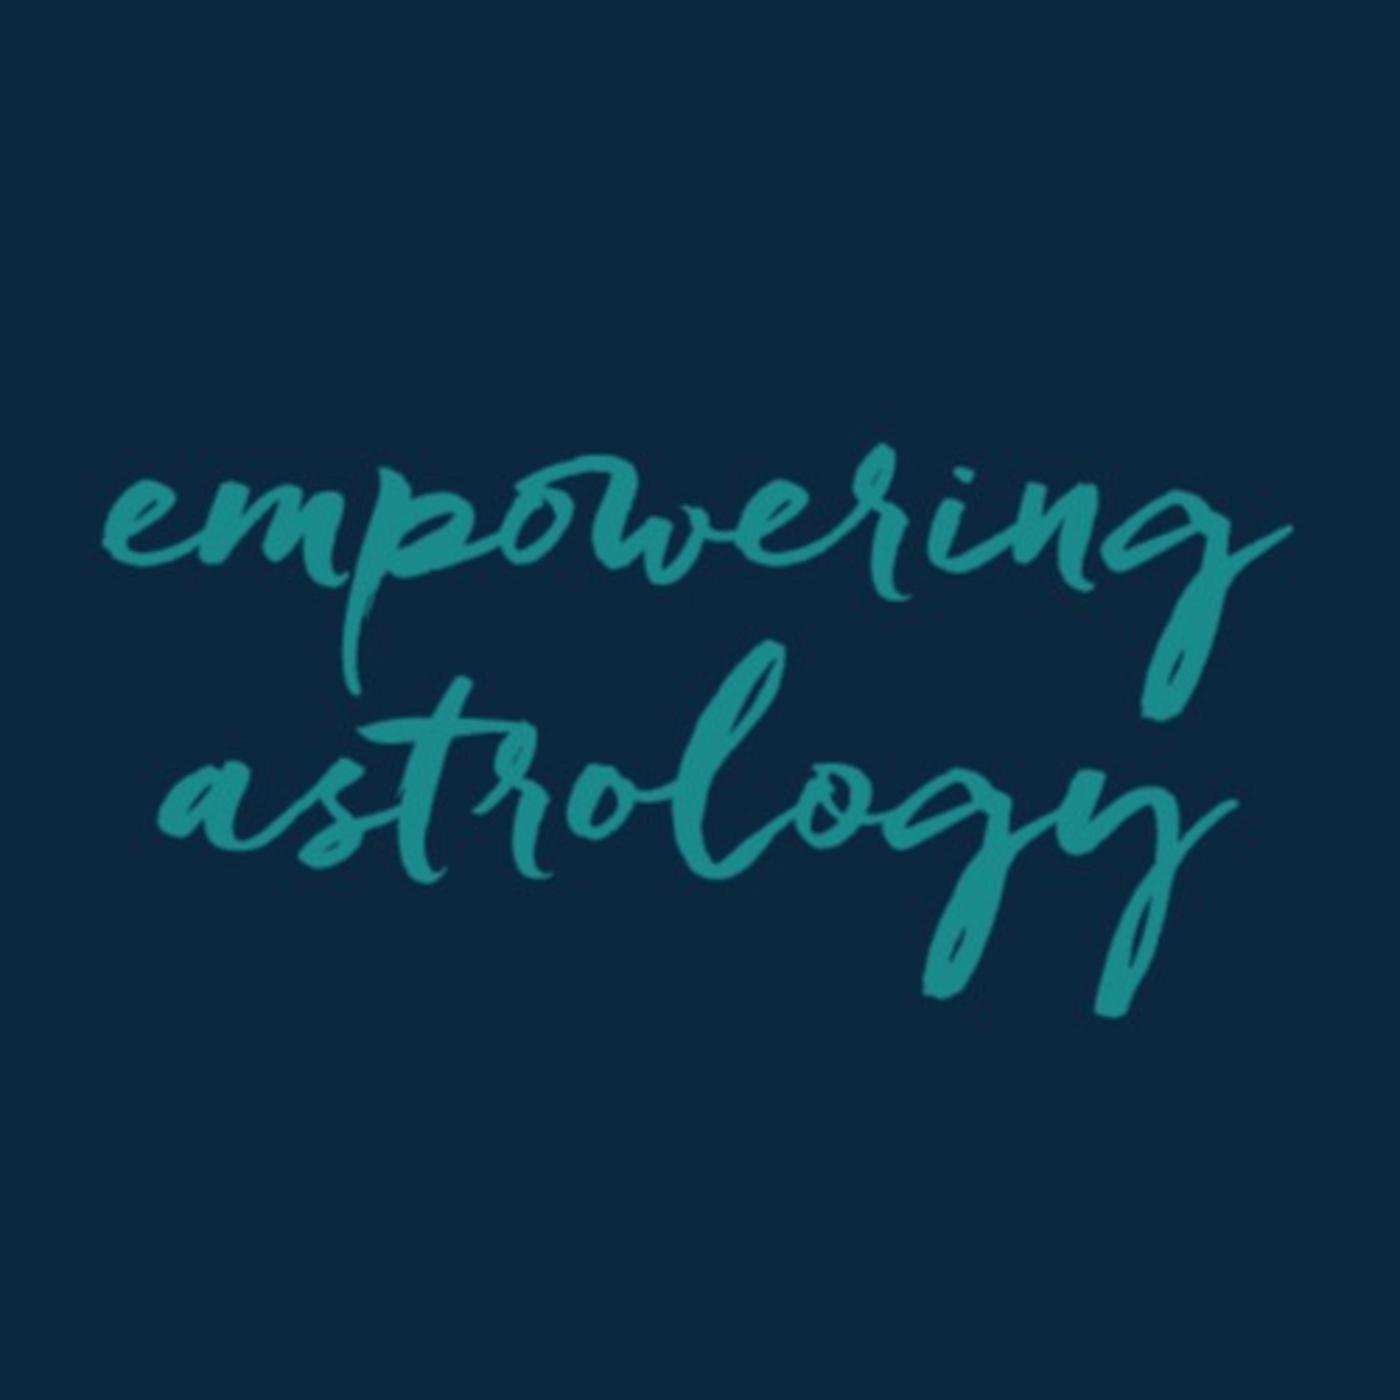 March 20 zodiac sign astrology